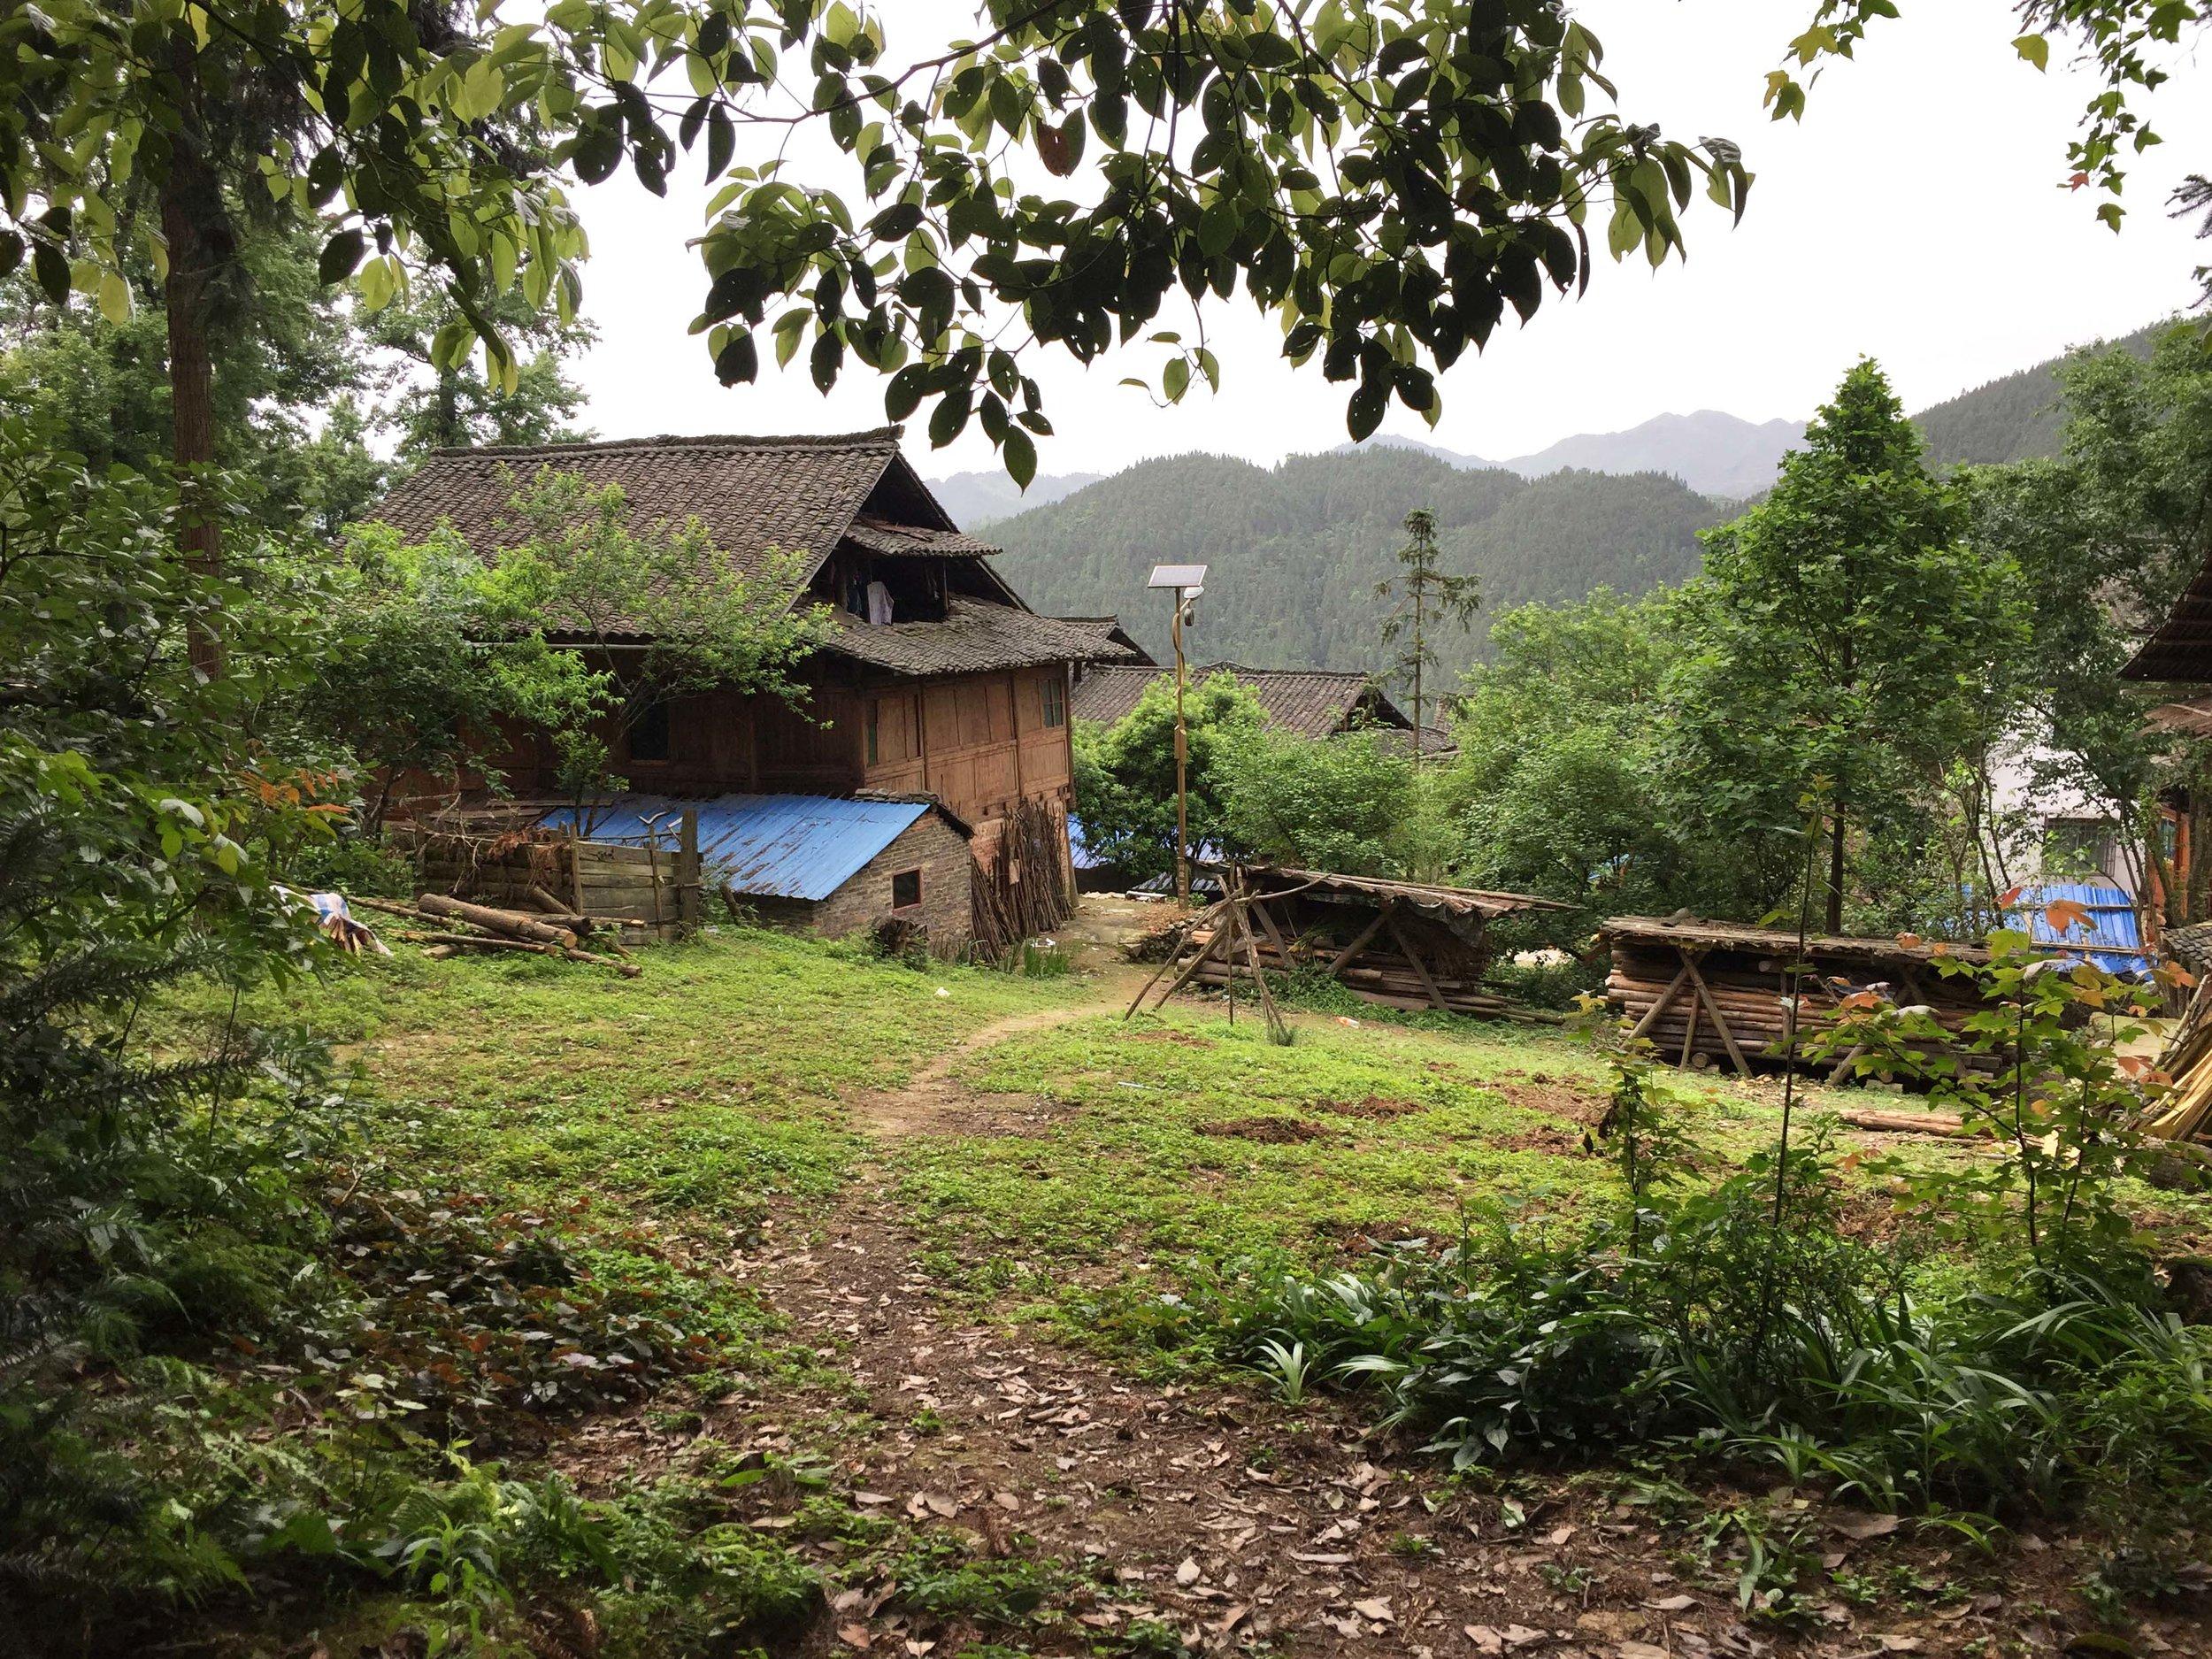 Zhanliu village. Such an idyllic view